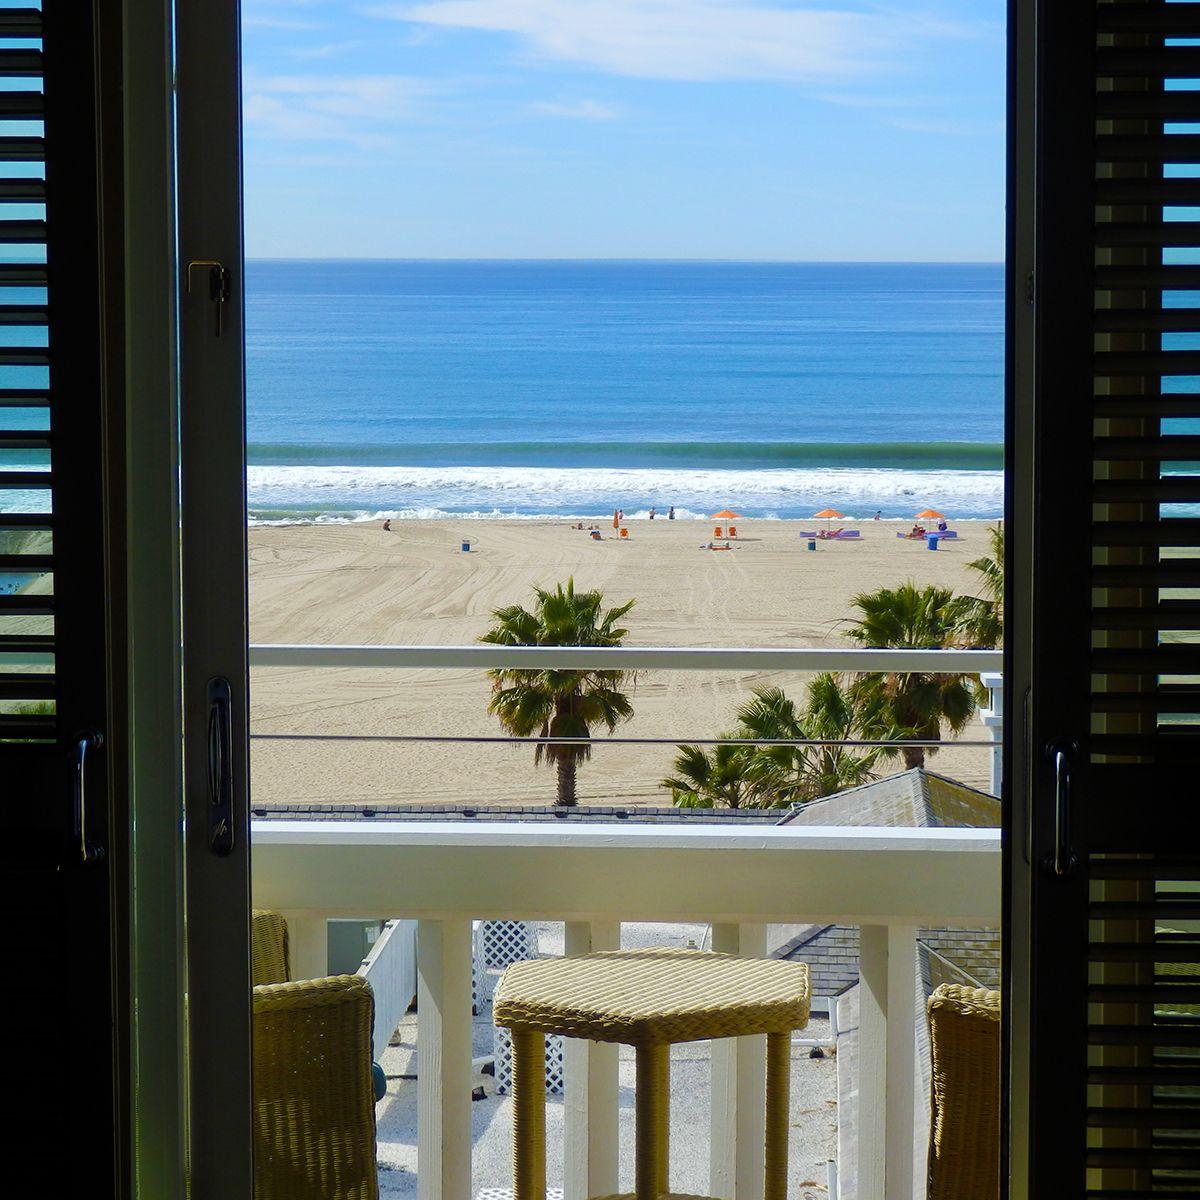 7th Floor View Luxury Hotel Shutters On The Beach Santa Monica Ca